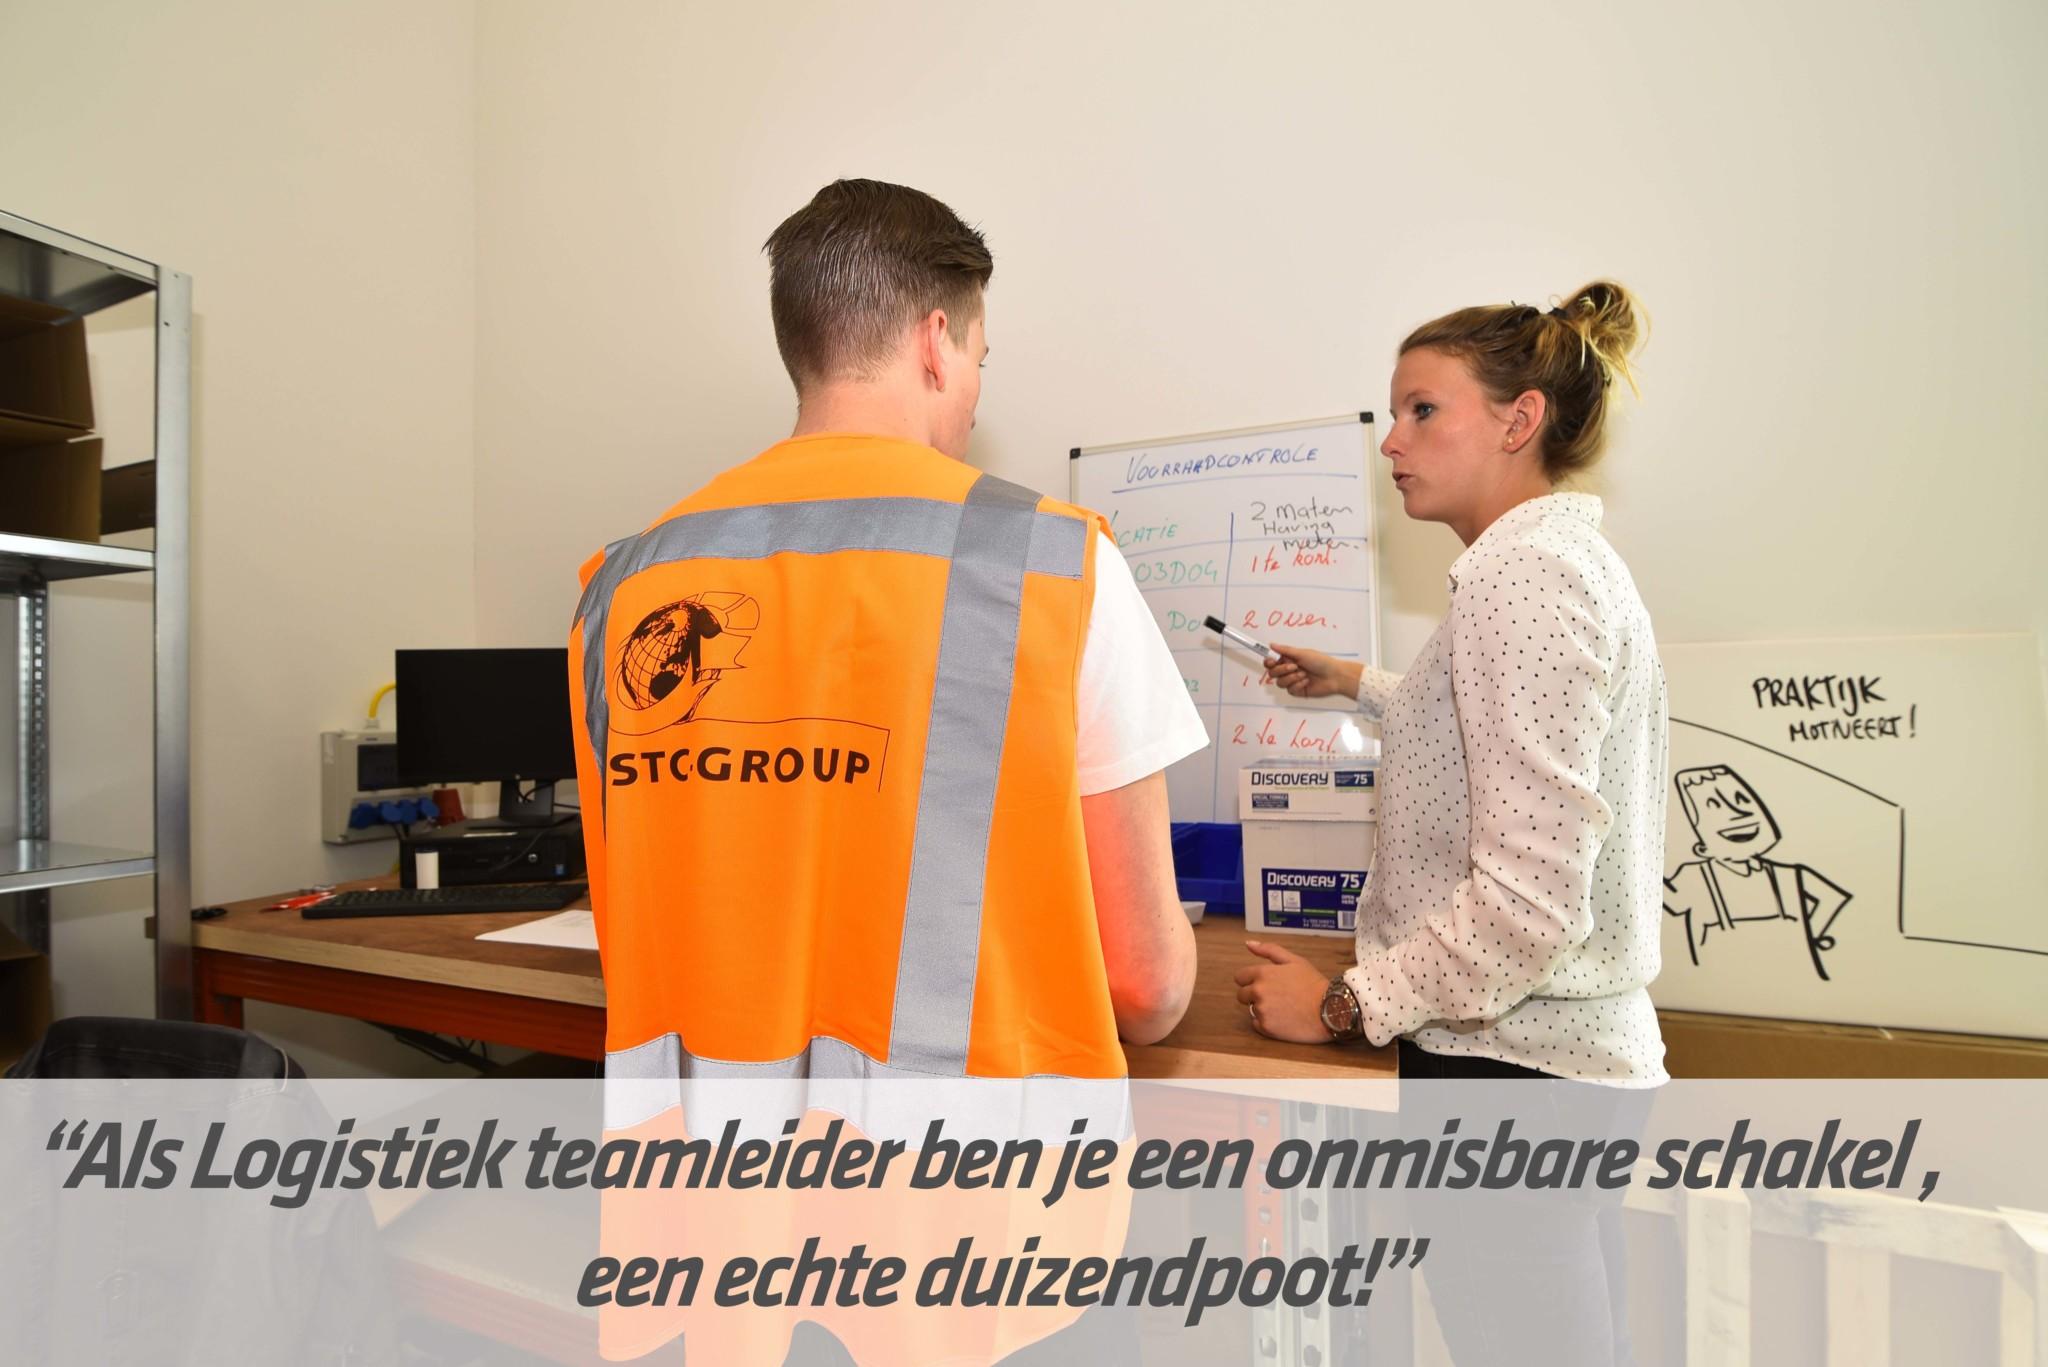 mbo-opleiding logistiek teamleider | STC mbo college Rotterdam